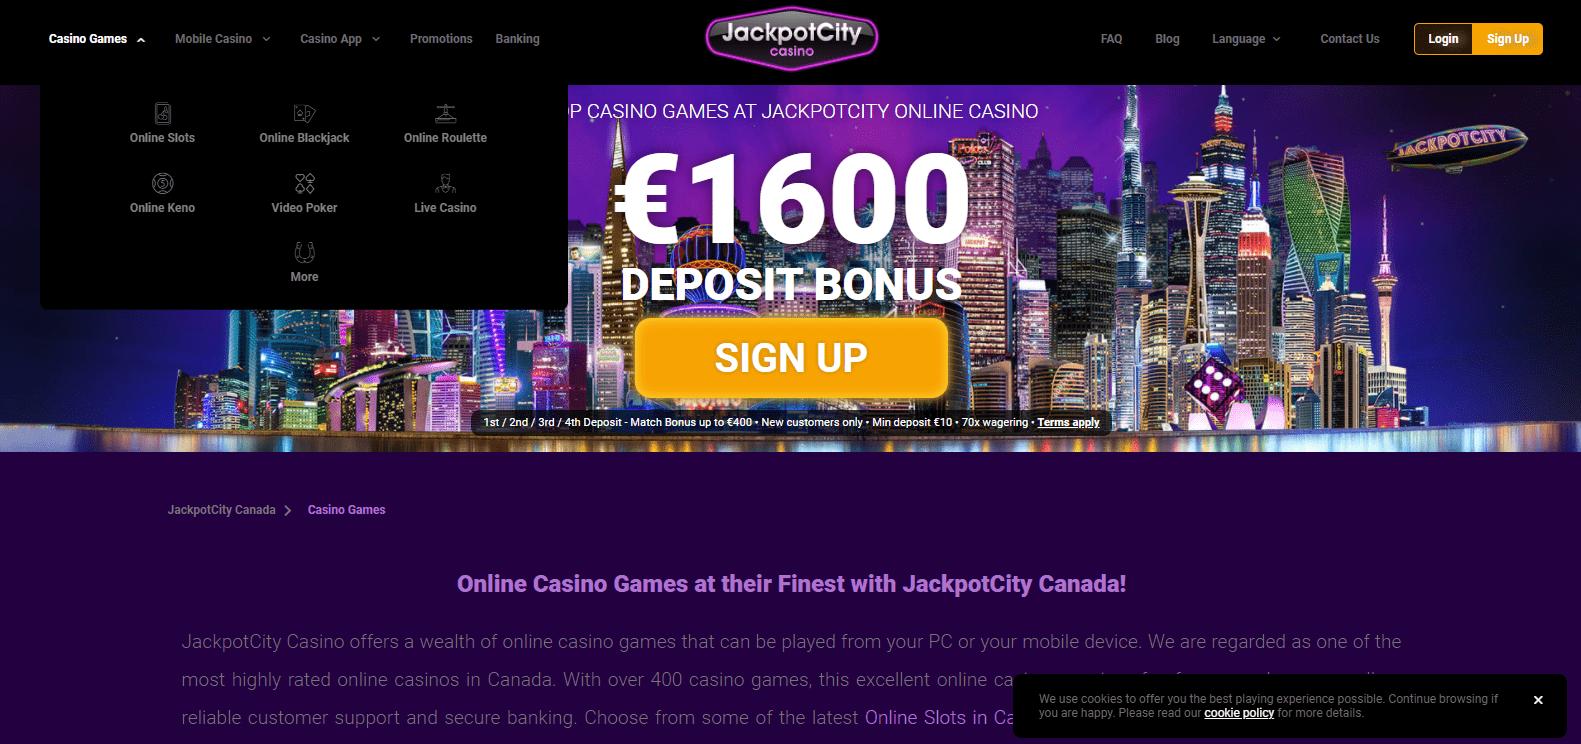 Jackpot City Casino games